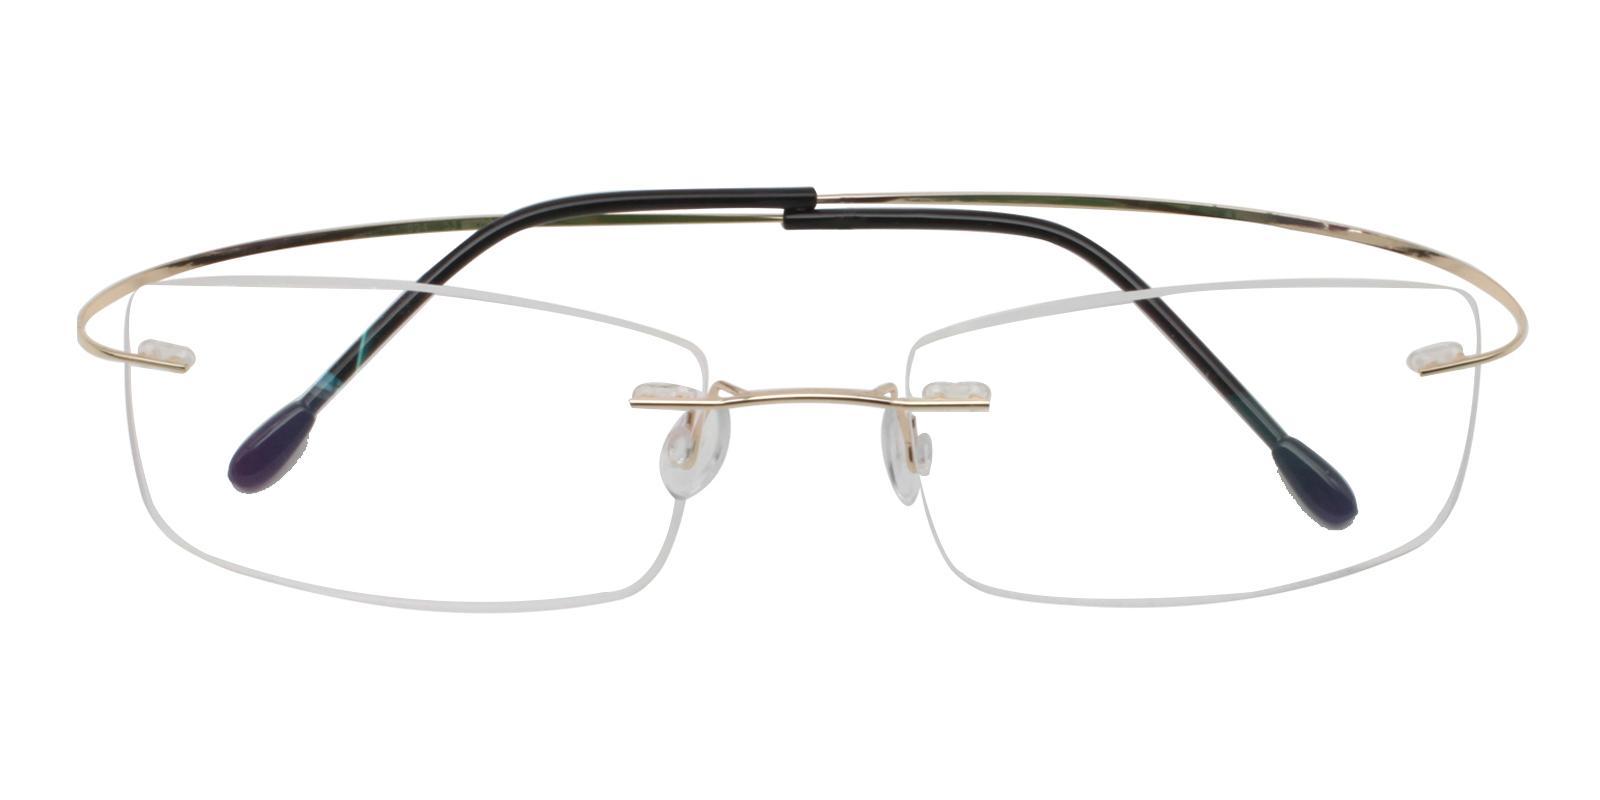 Pluto Gold Metal , Memory Eyeglasses , NosePads Frames from ABBE Glasses